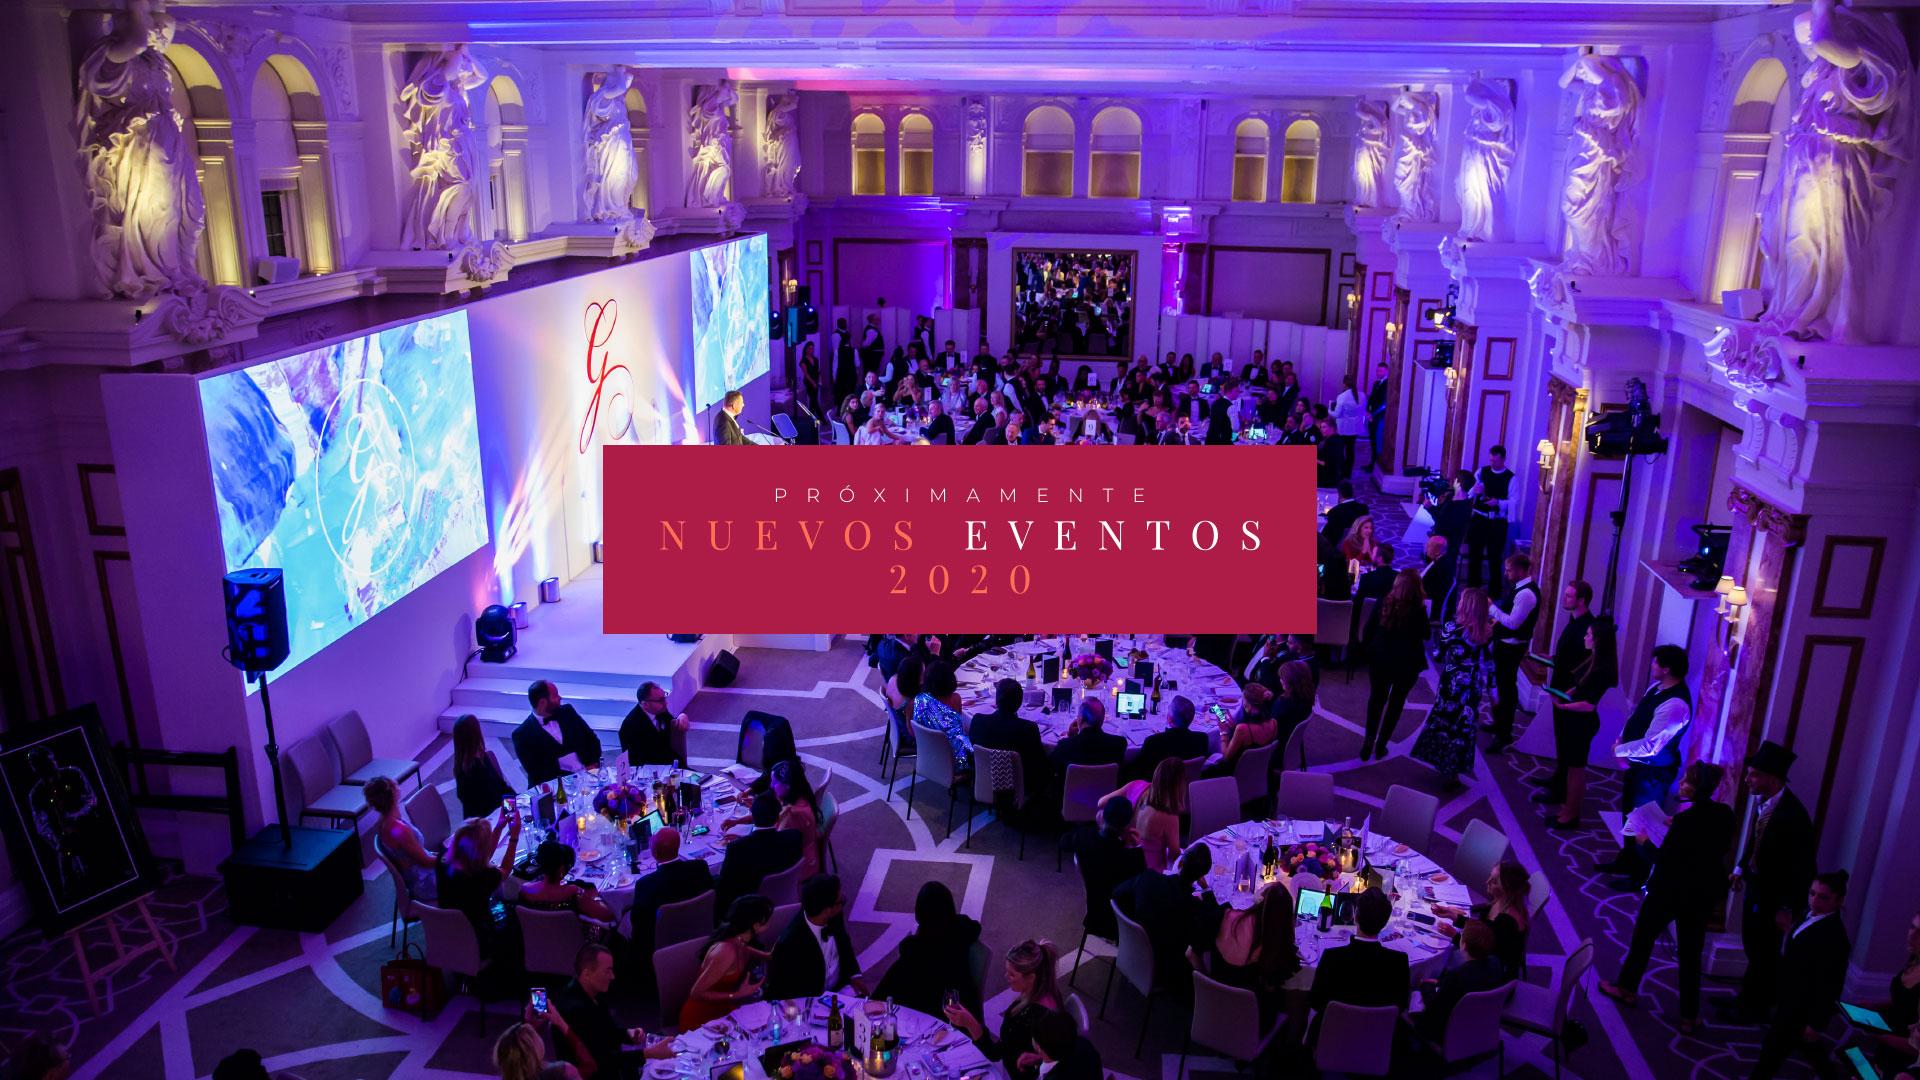 Nuevos Eventos 2020 The Global Gift Gala